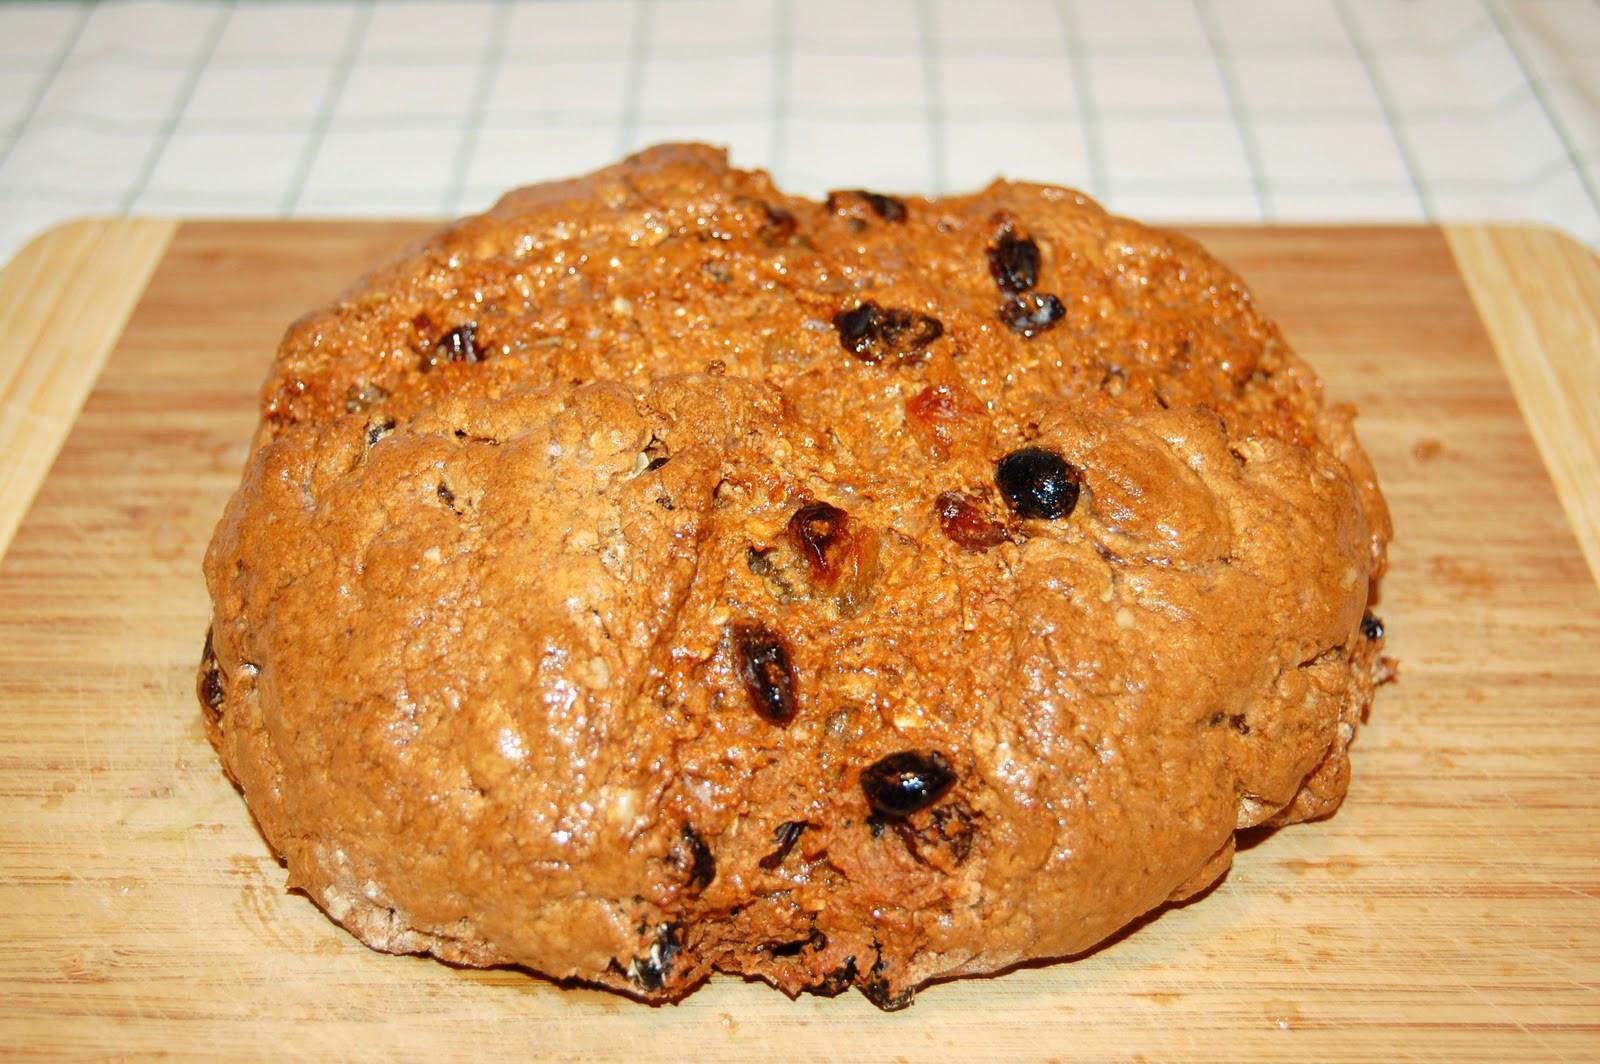 Irish Soda Bread With Raisins  Southern Lady s Recipes Irish Soda Bread with Raisins